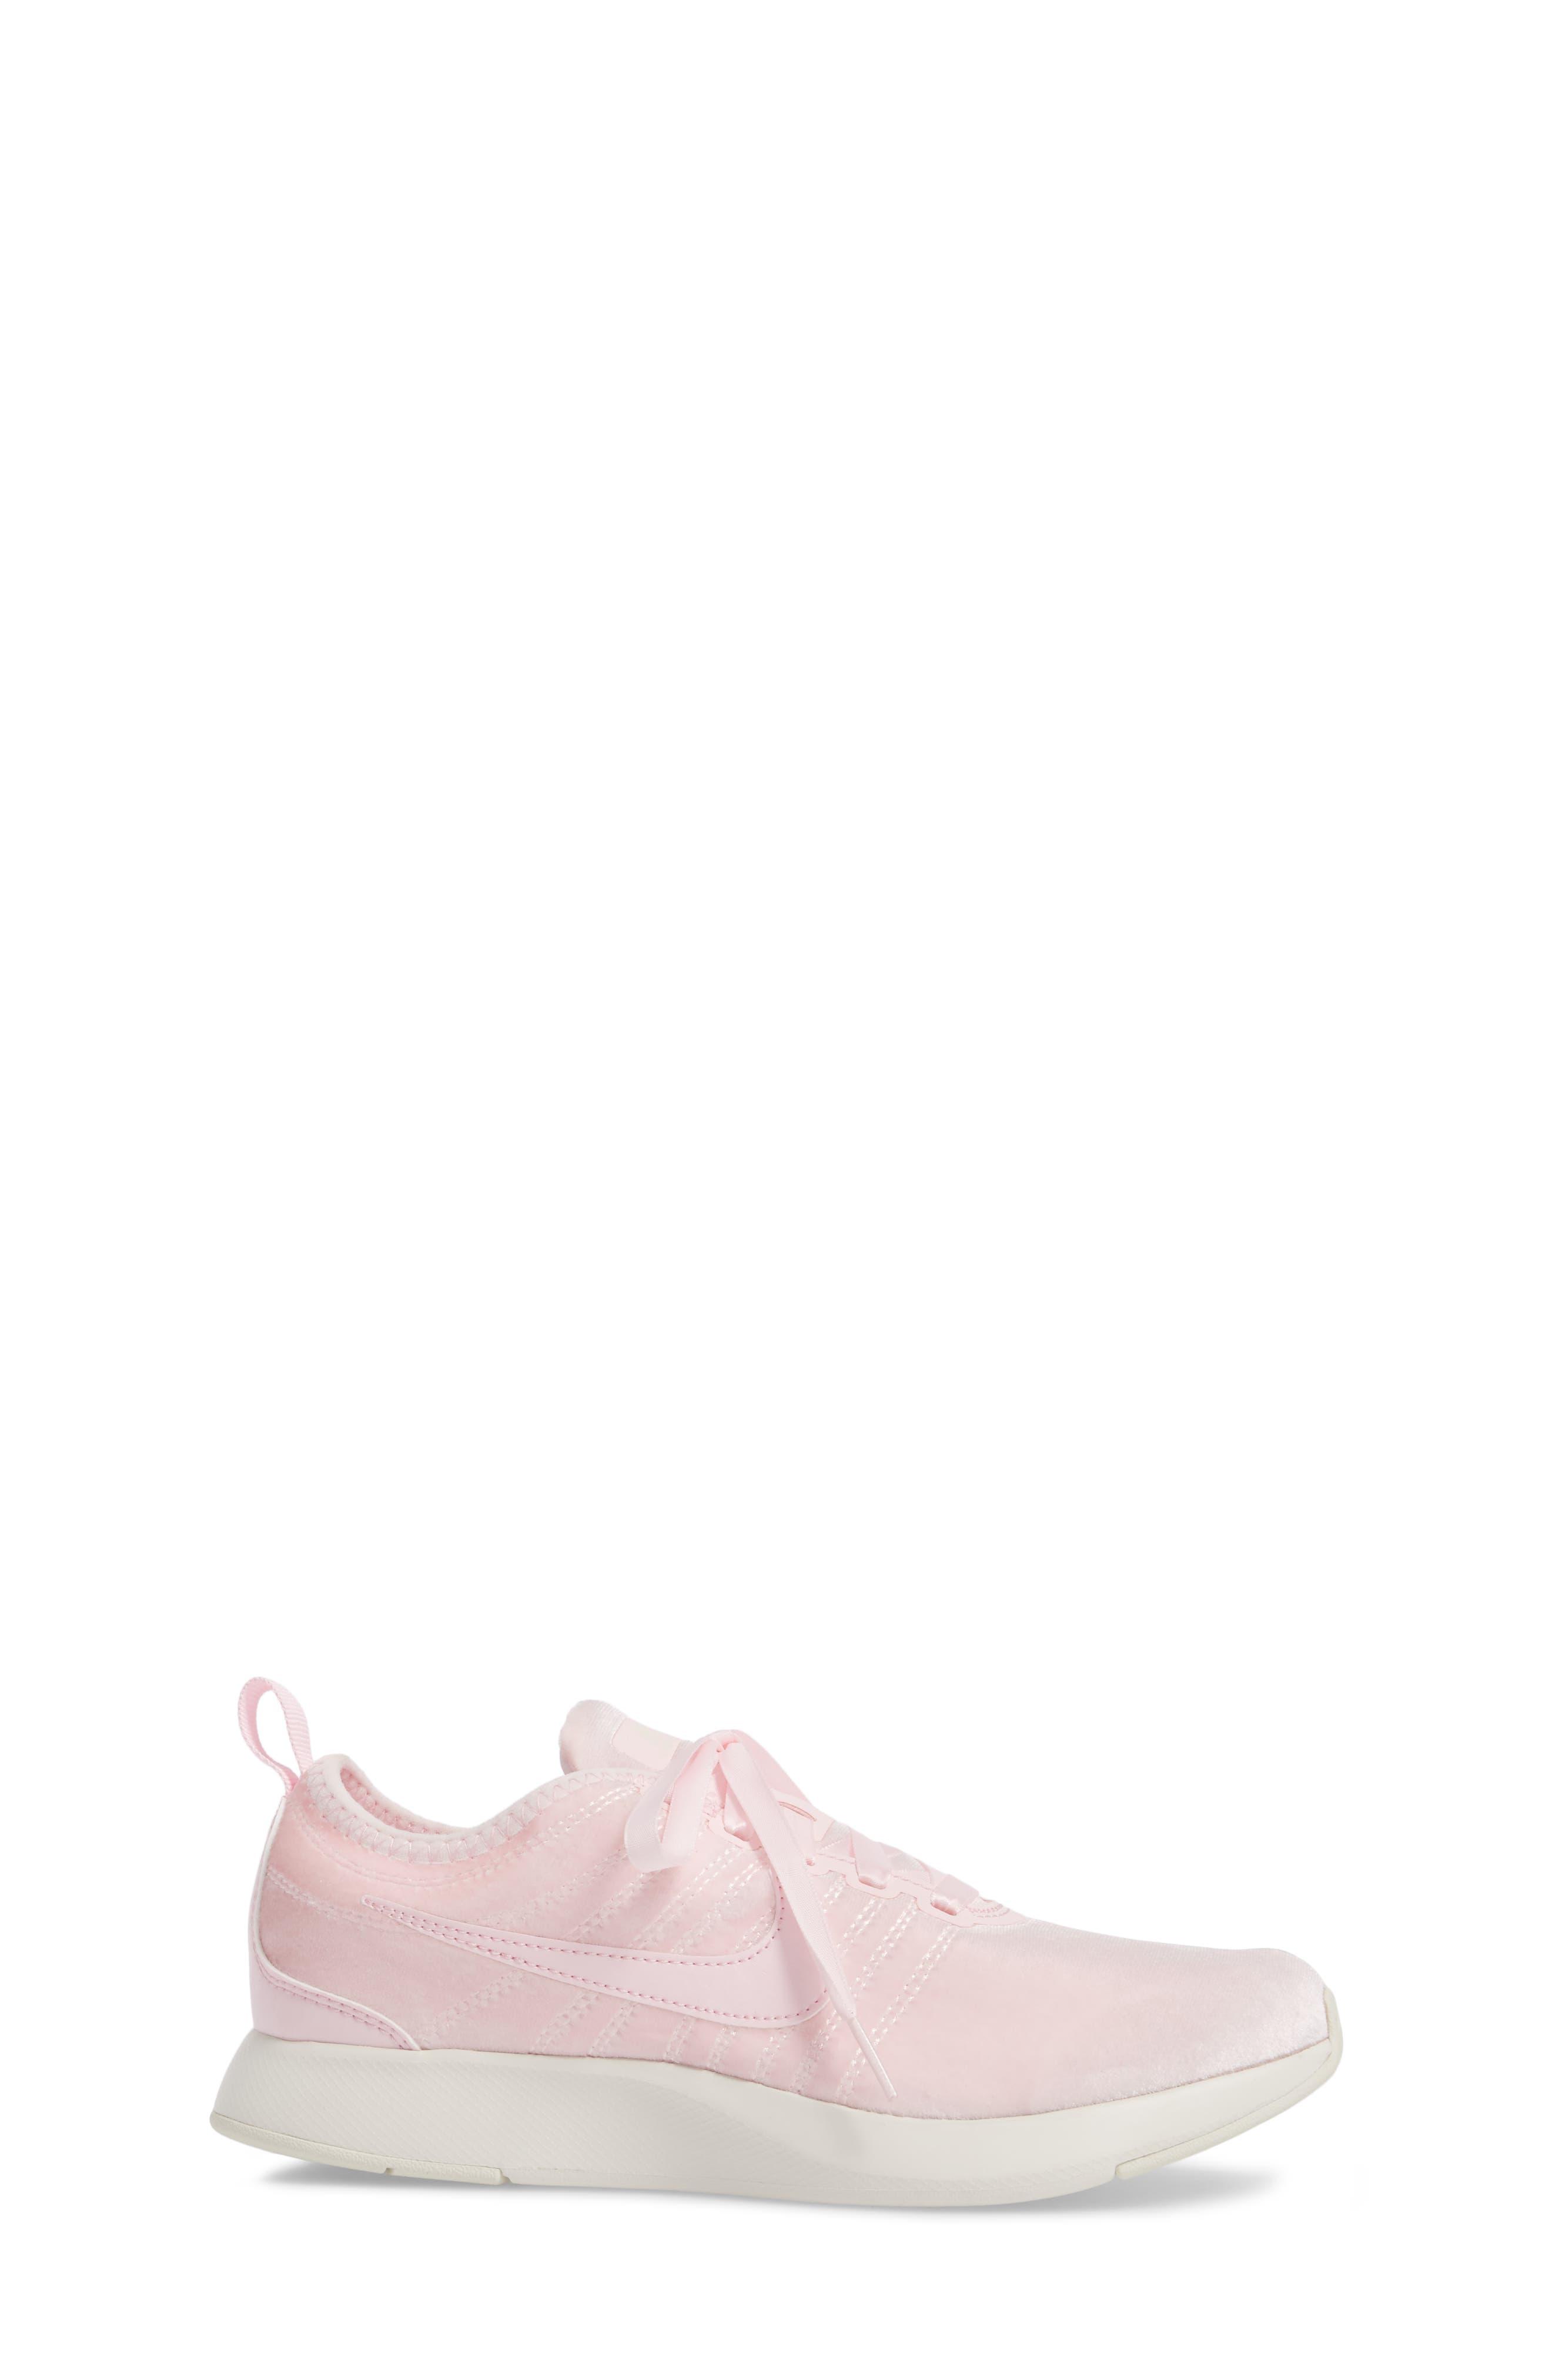 Dualtone Racer SE Sneaker,                             Alternate thumbnail 3, color,                             Arctic Pink/ Arctic Pink/ Sail